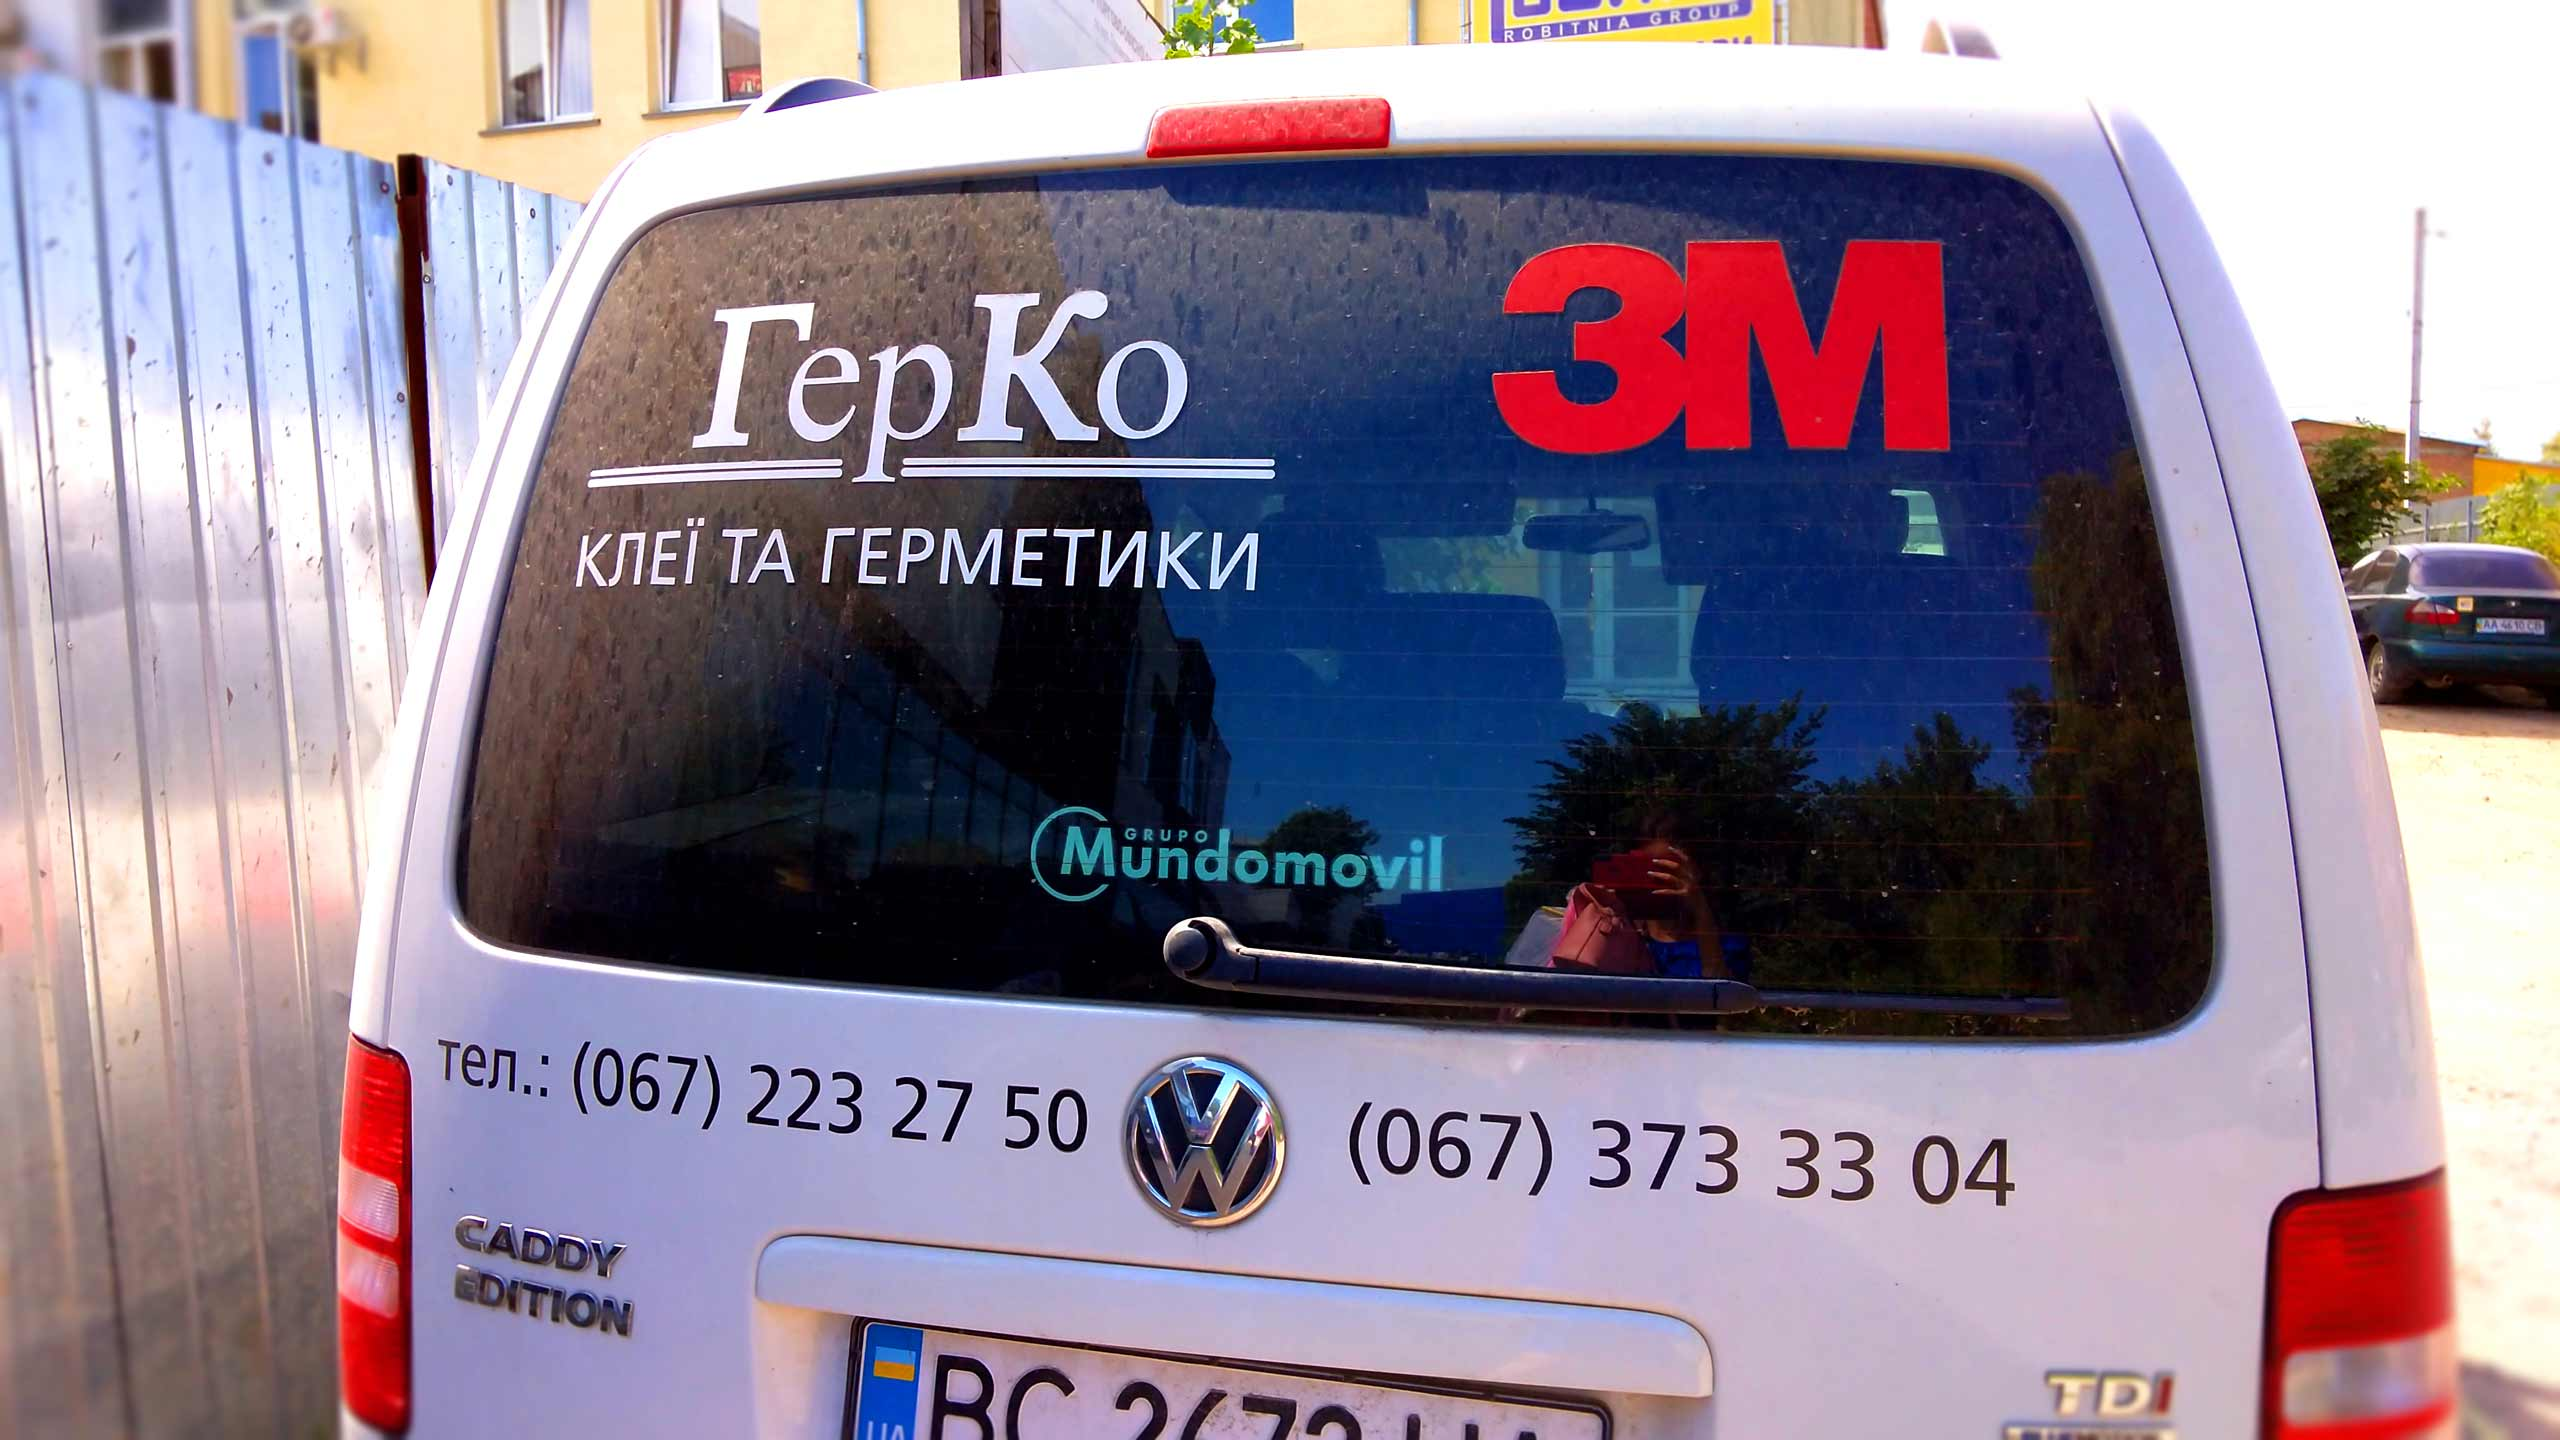 реклама на скло авто